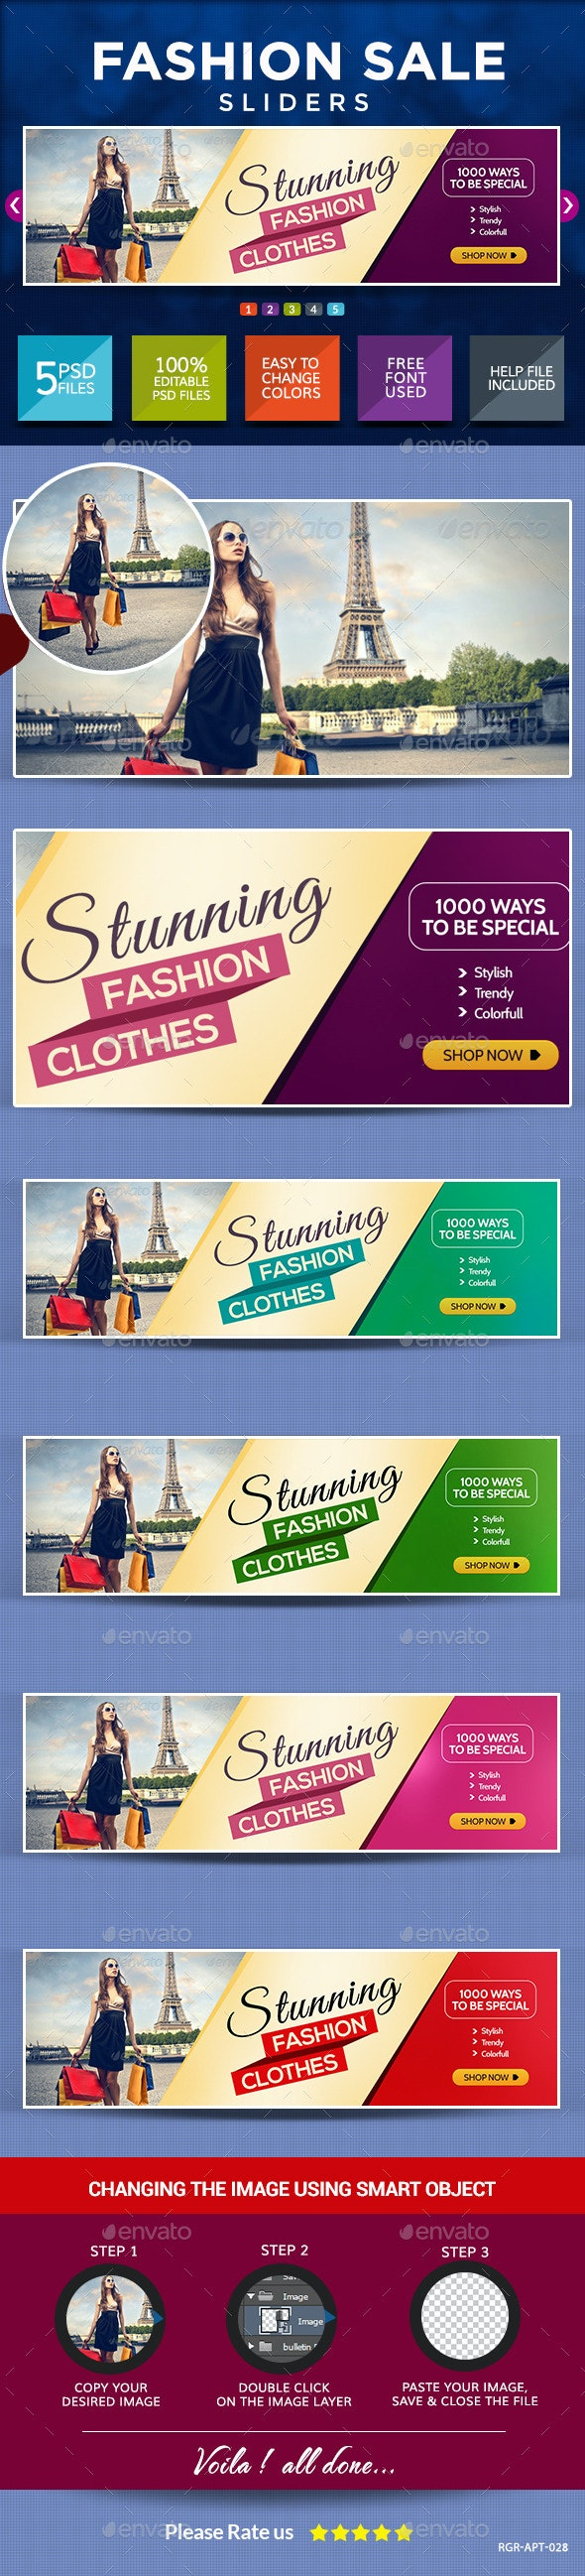 Fashion Sale Sliders - Sliders & Features Web Elements